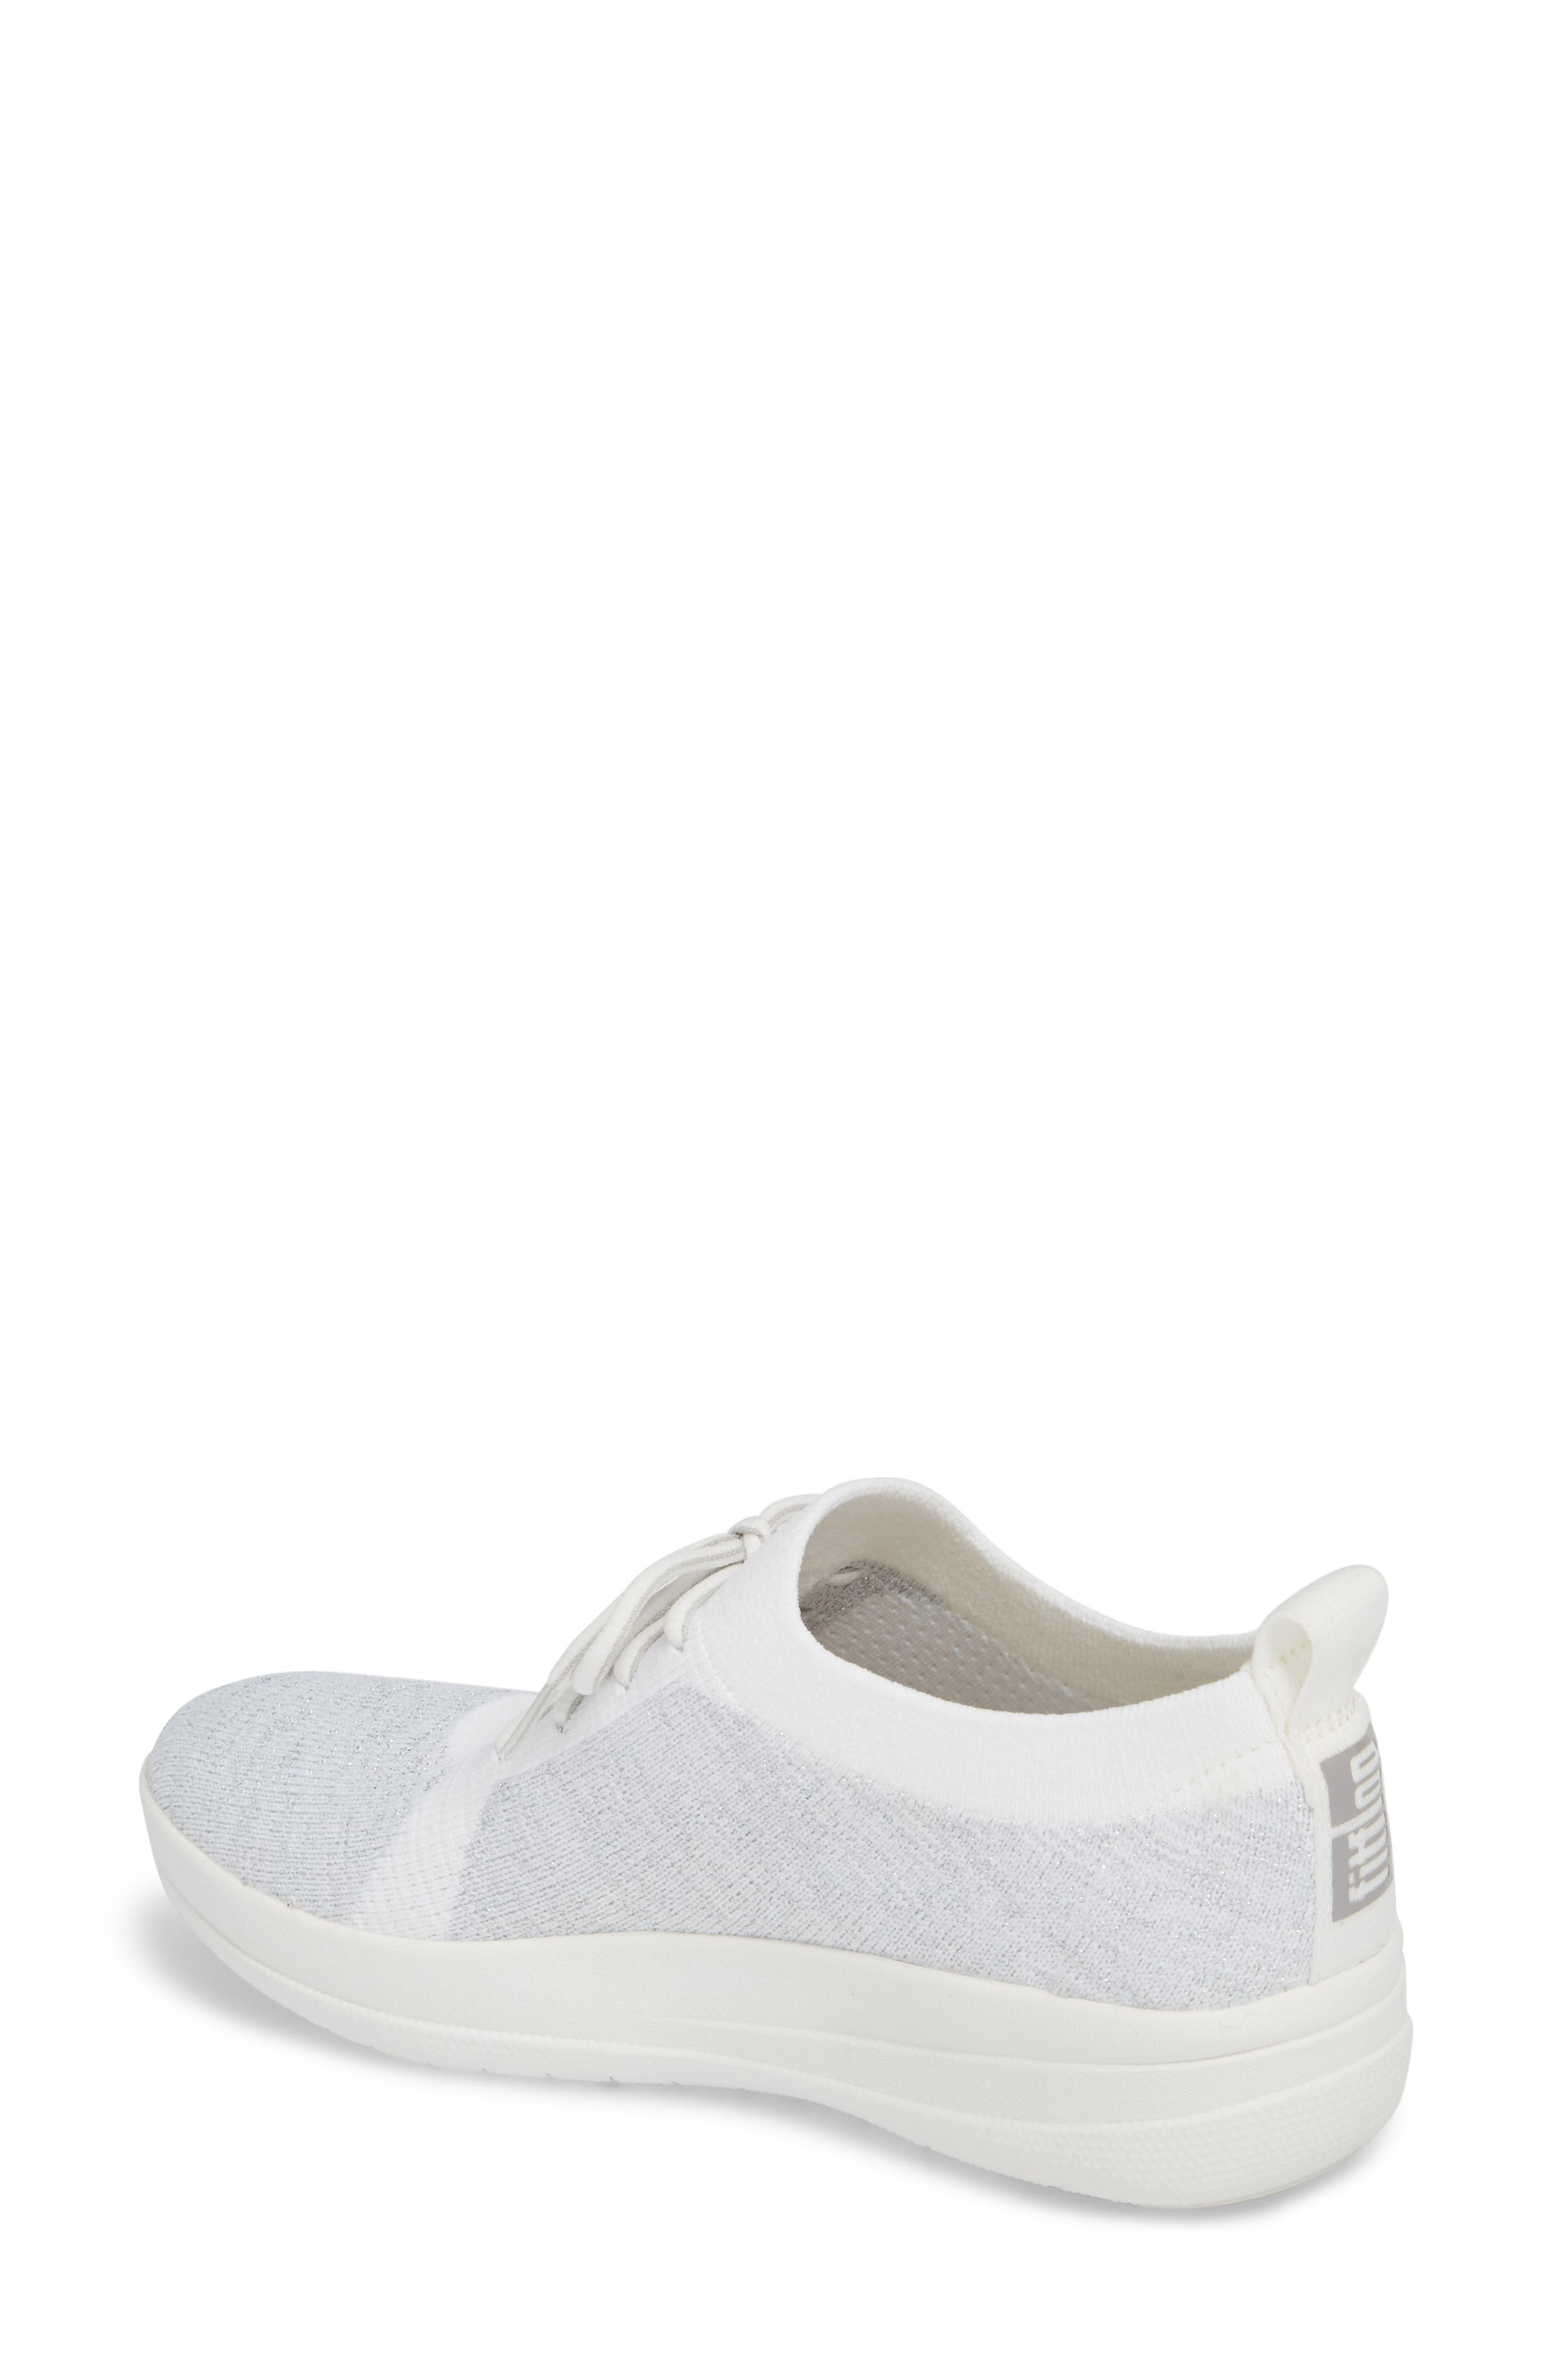 FITFLOP,                             Uberknit<sup>™</sup> F-Sporty Sneaker,                             Alternate thumbnail 2, color,                             METALLIC SILVER/ URBAN WHITE